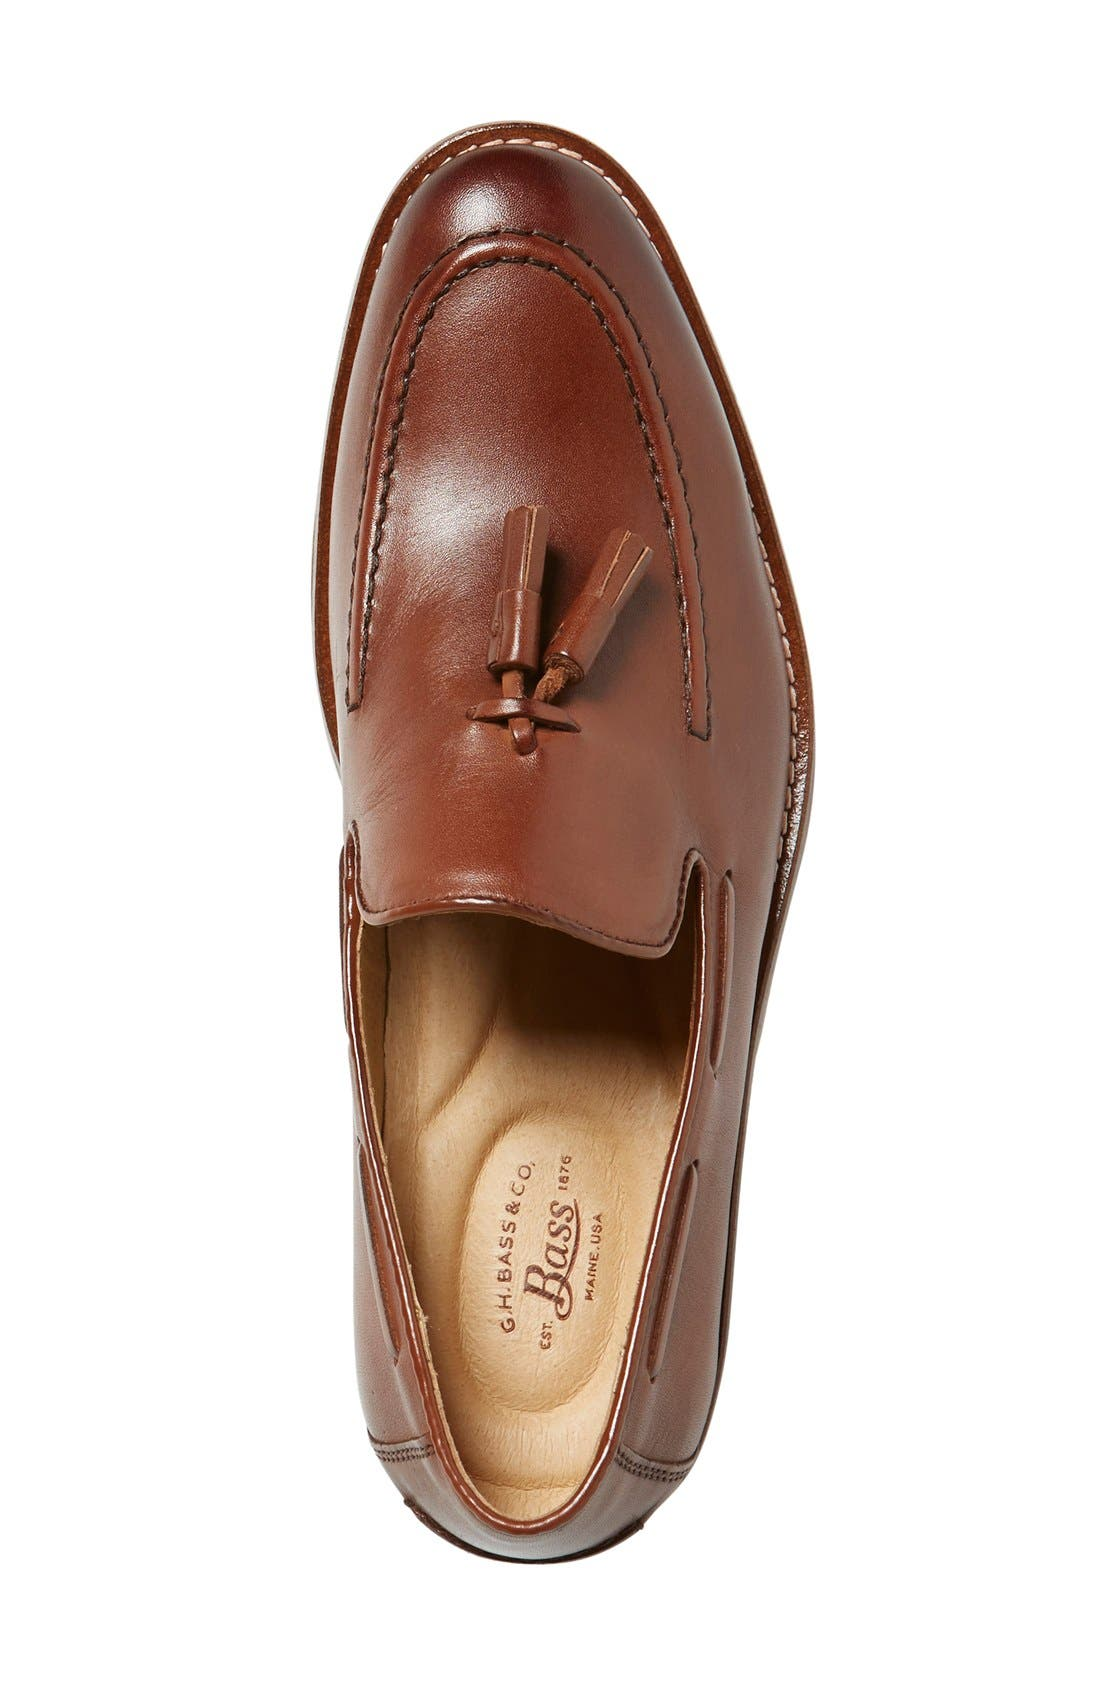 'Cooper' Tassel Loafer,                             Alternate thumbnail 3, color,                             Tan Leather